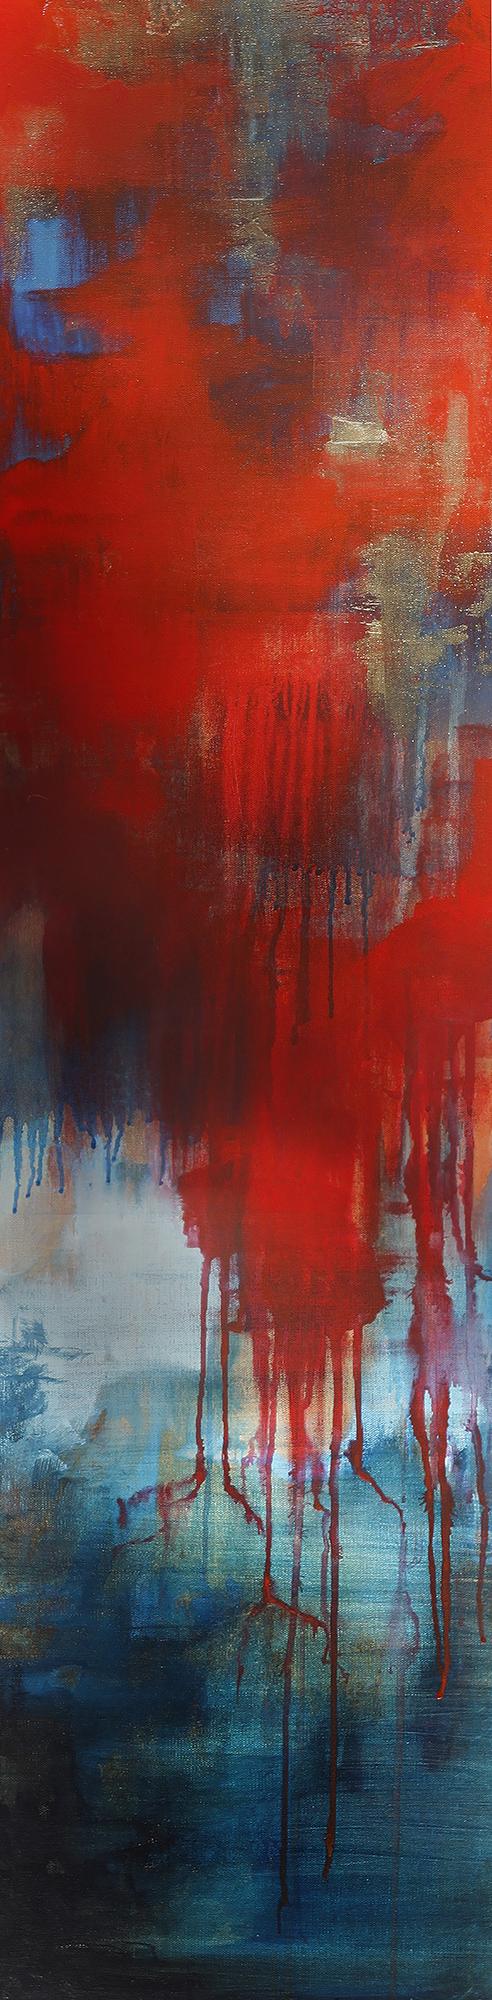 Pentecost Painting blog